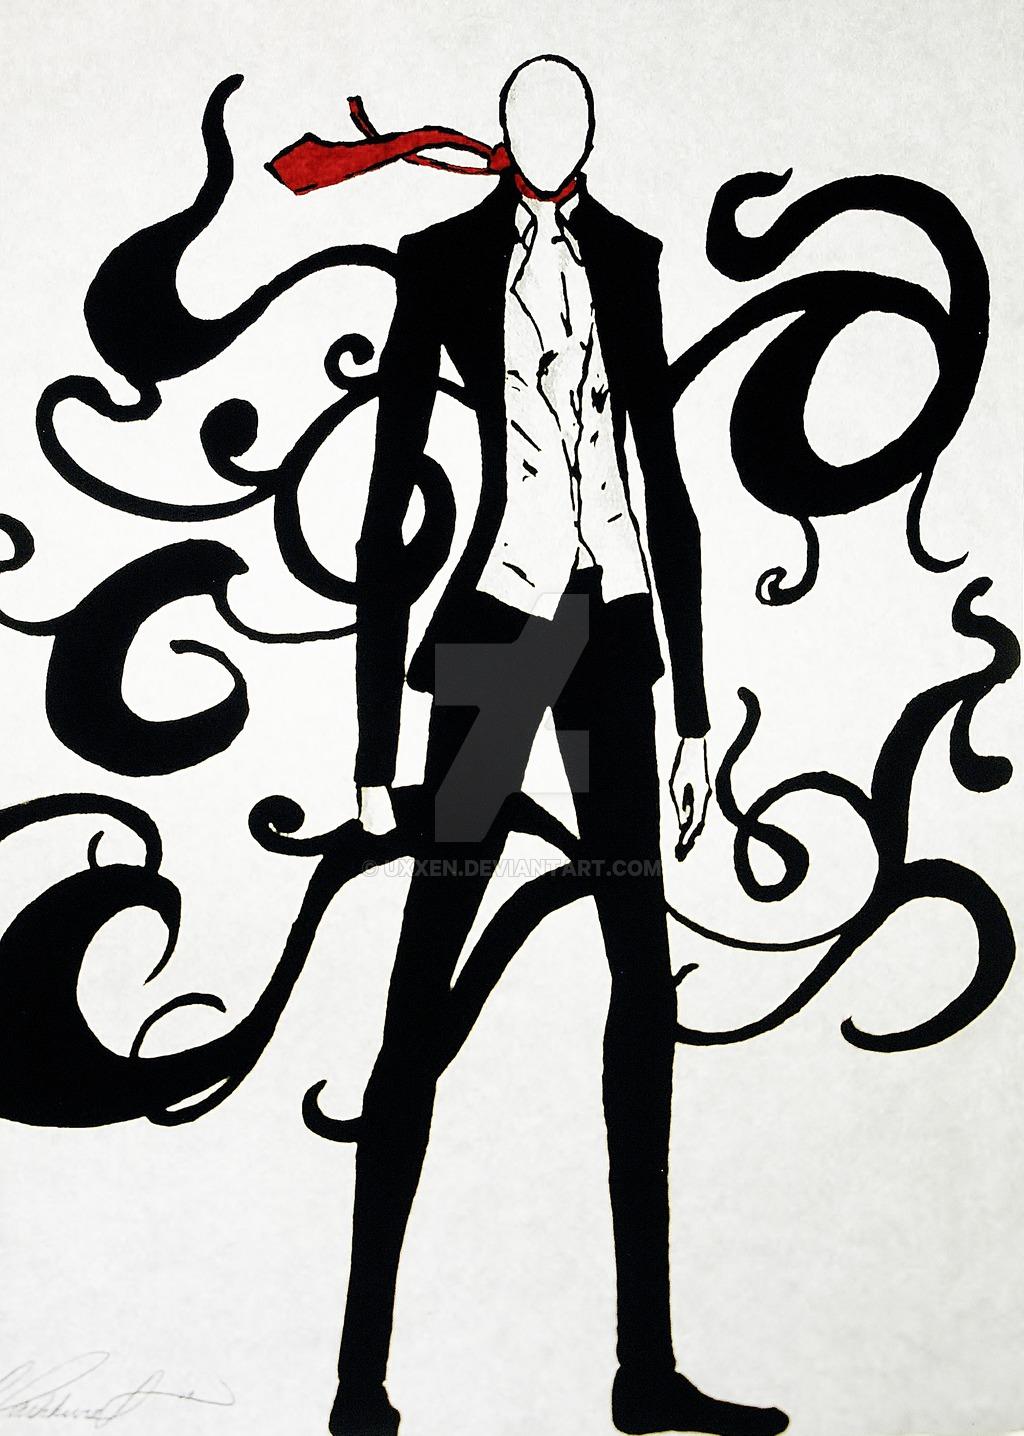 Drawn slenderman anime DeviantArt on uxxen by Slender